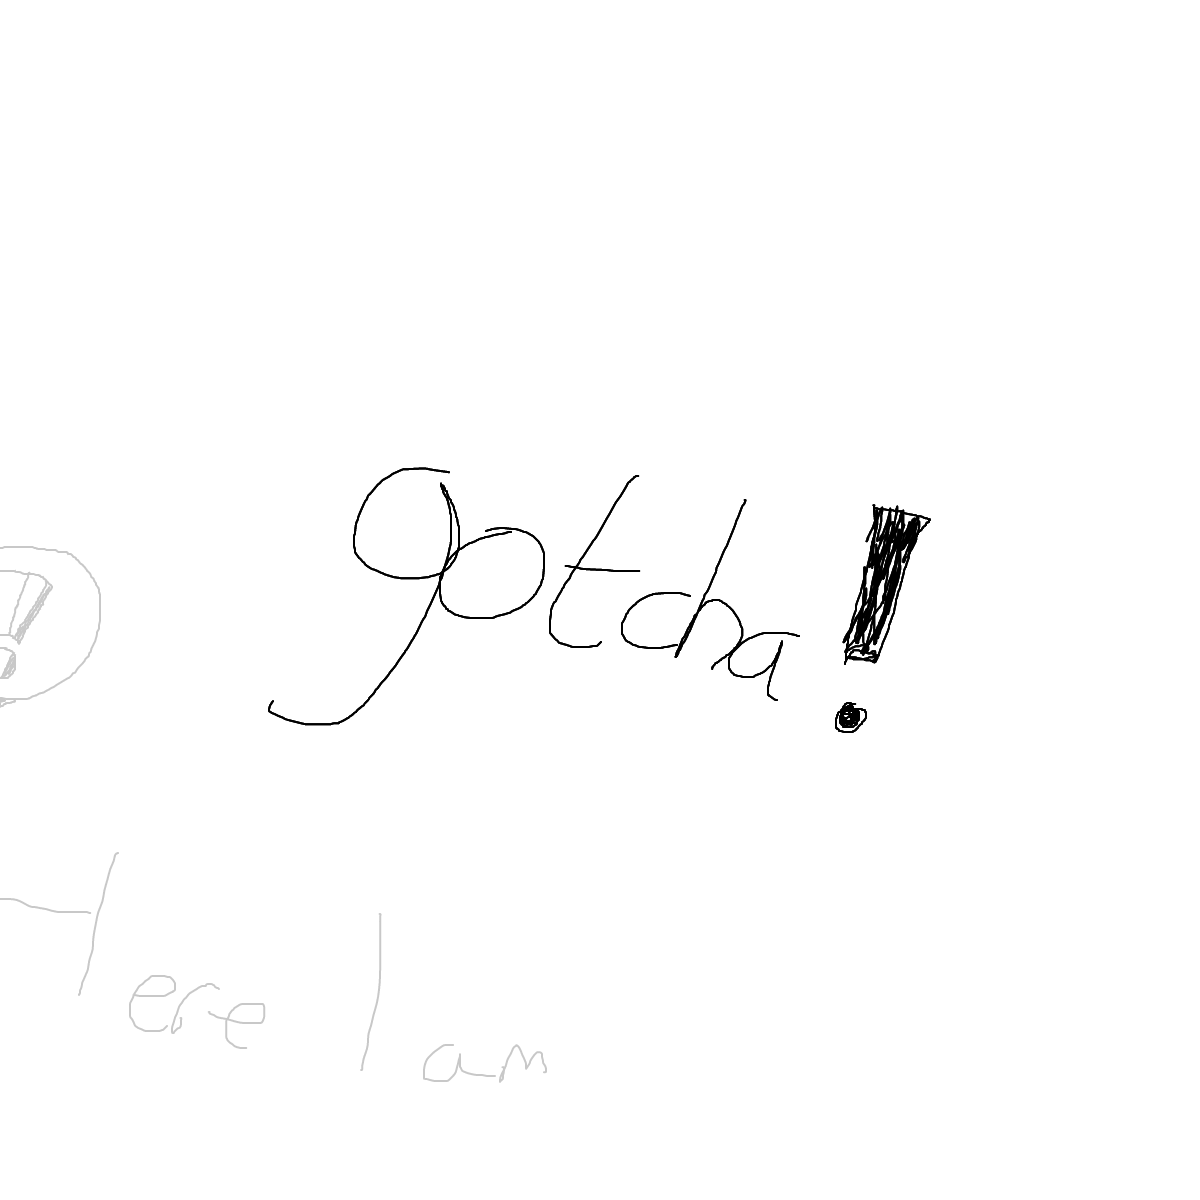 BAAAM drawing#23313 lat:50.4861335754394500lng: -4.4716596603393555